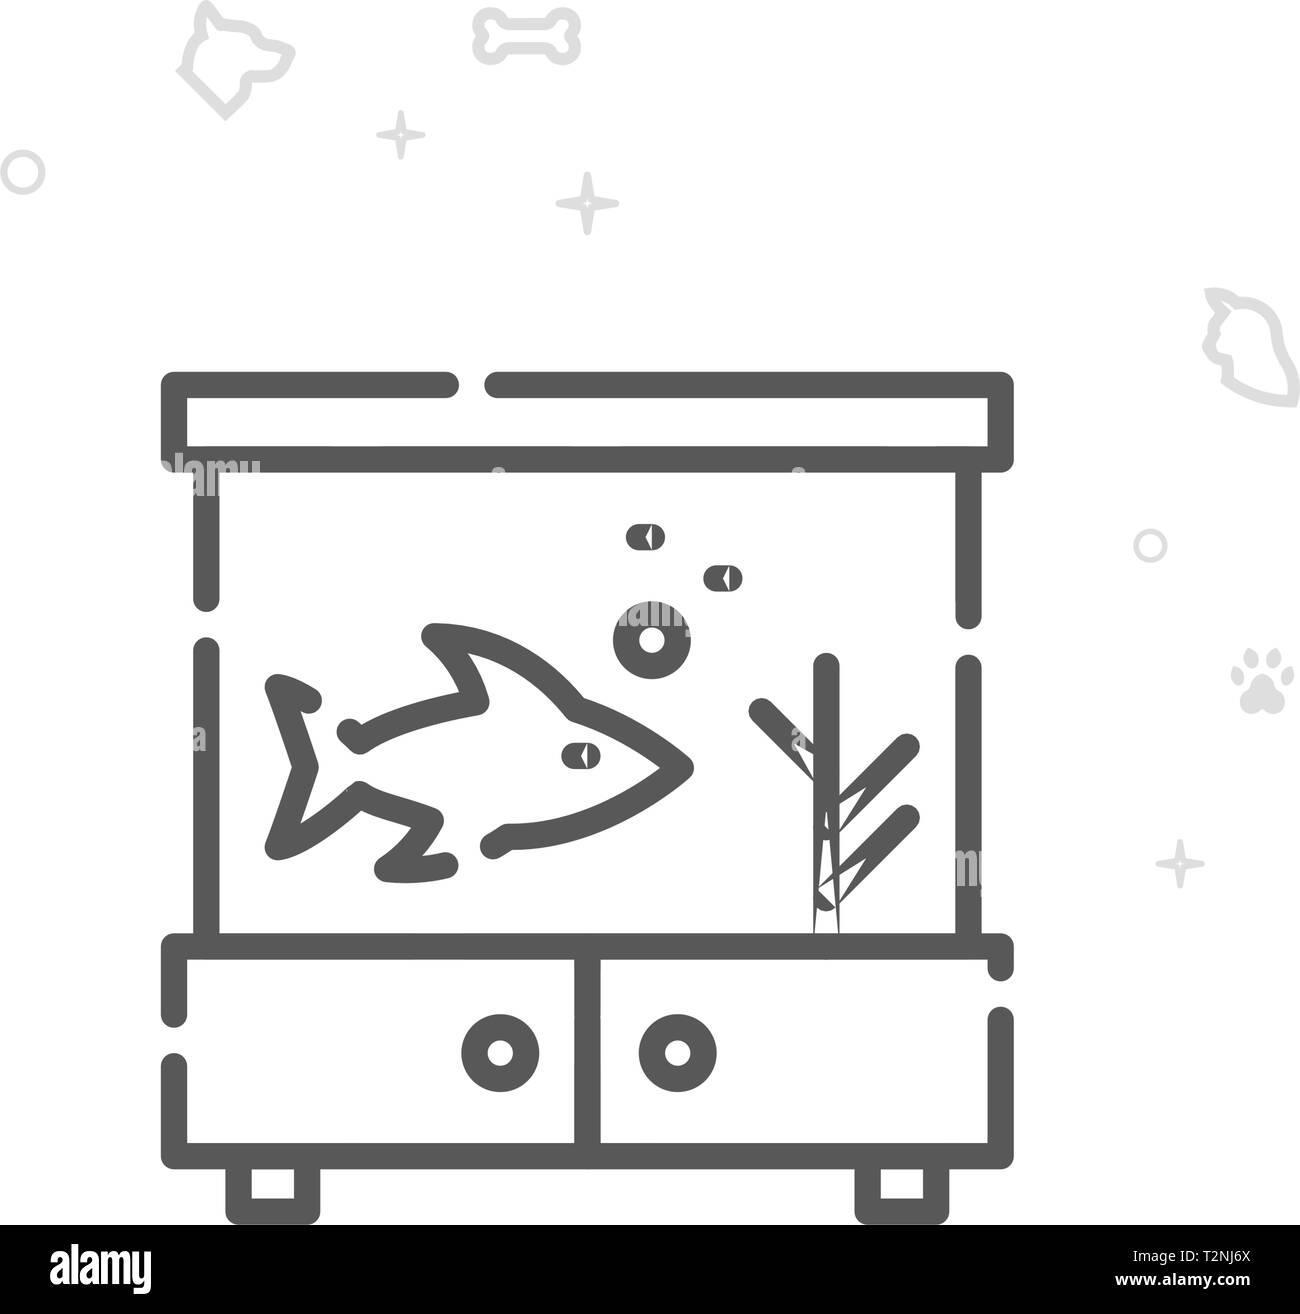 Aquarium Vector Line Icon. Pet Supplies Symbol, Pictogram, Sign. Light Abstract Geometric Background. Editable Stroke. Adjust Line Weight. - Stock Image